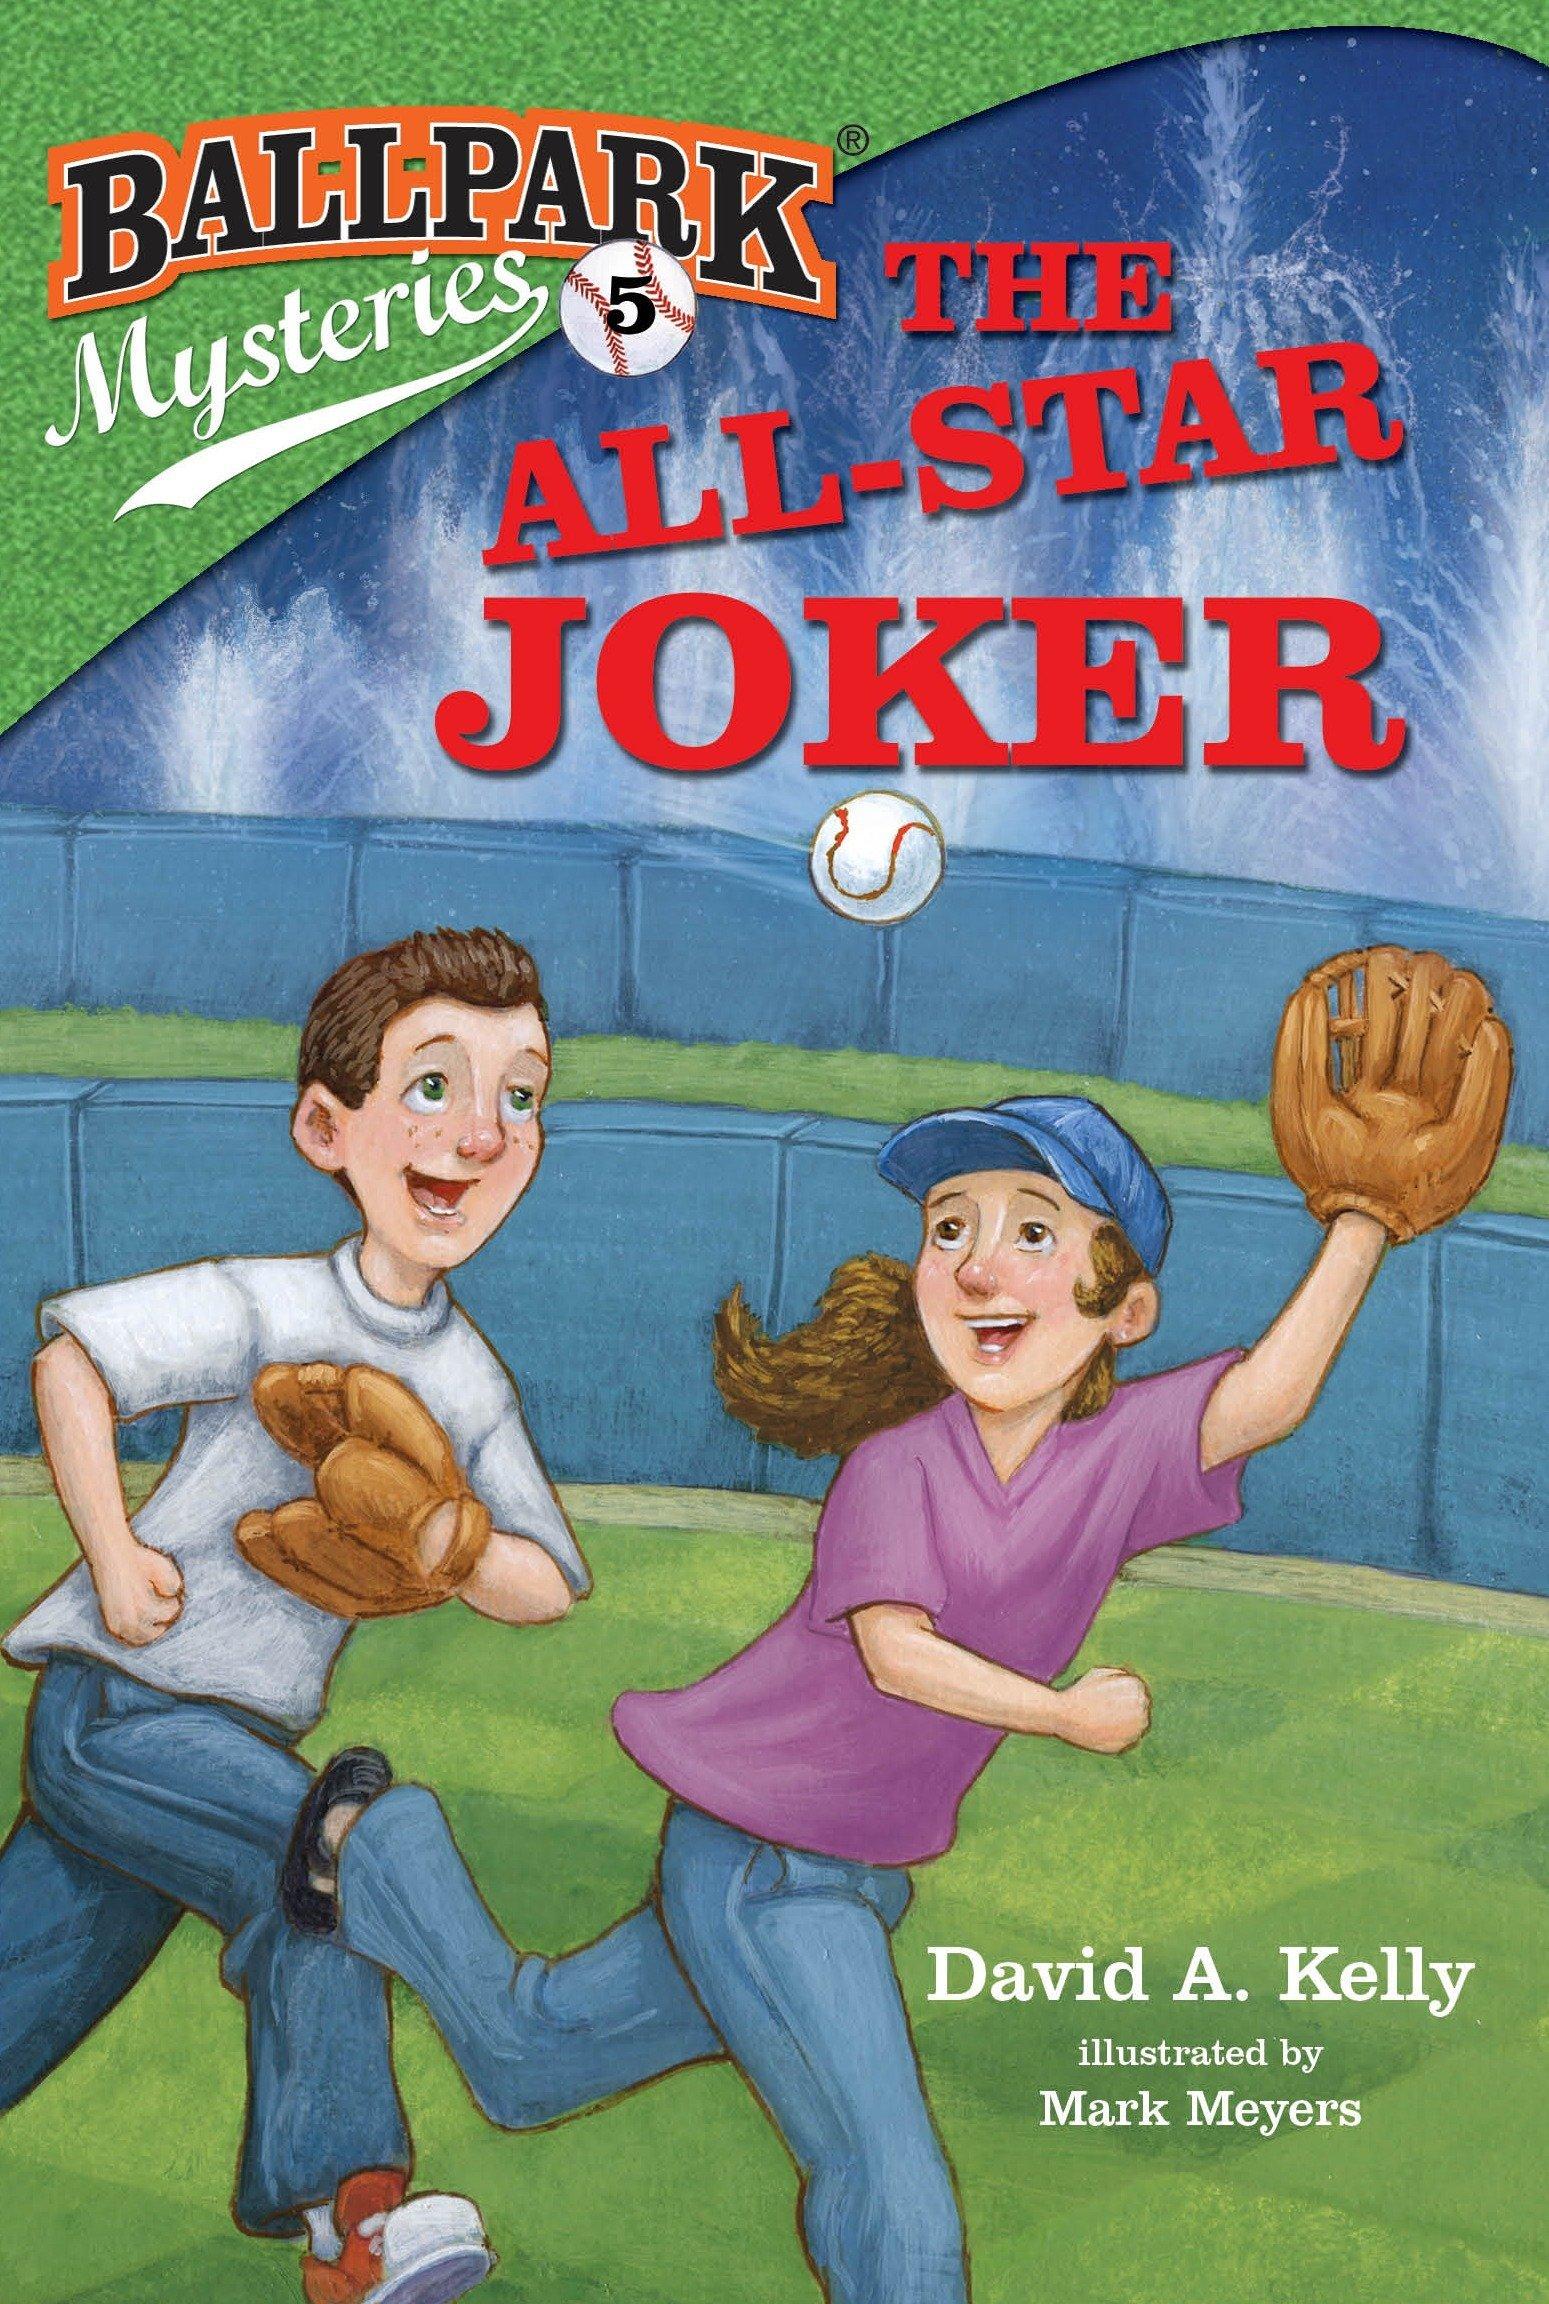 Amazon.com: Ballpark Mysteries #5: The All-Star Joker (9780375868849 ...